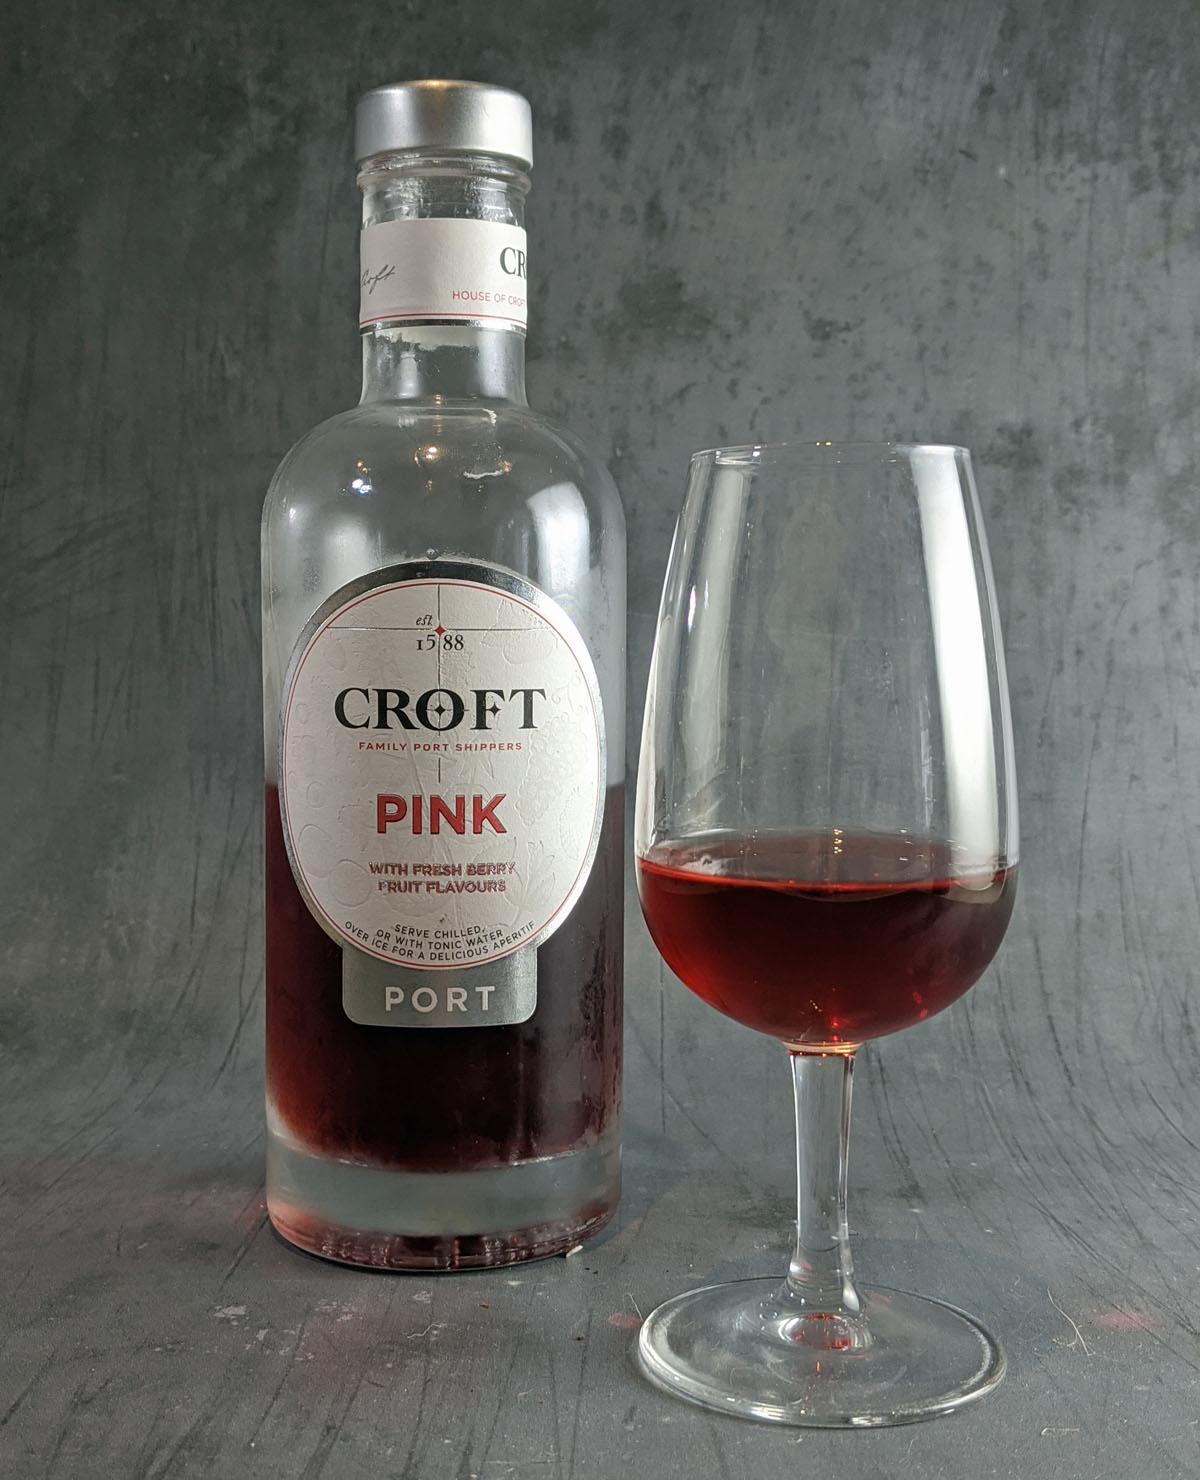 Croft Pink Port in a glass